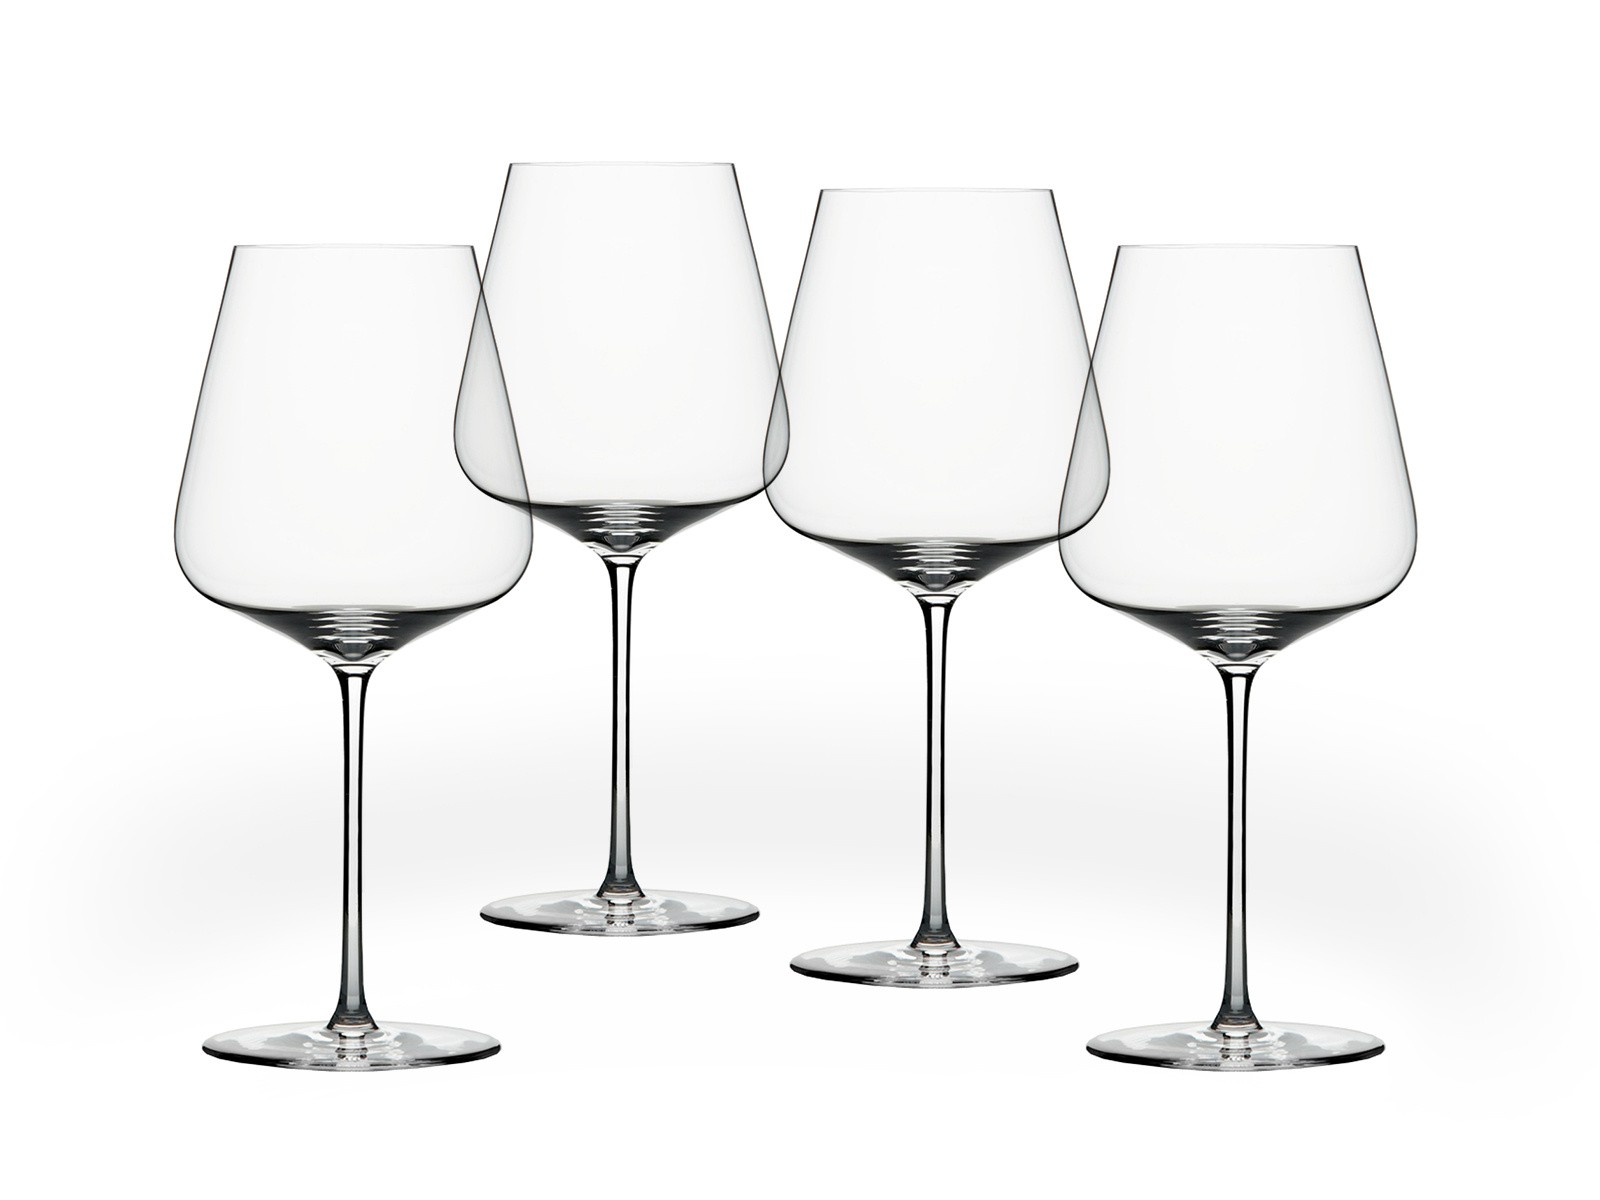 London restaurants' biggest mistakes of 2018: Zalto wineglasses